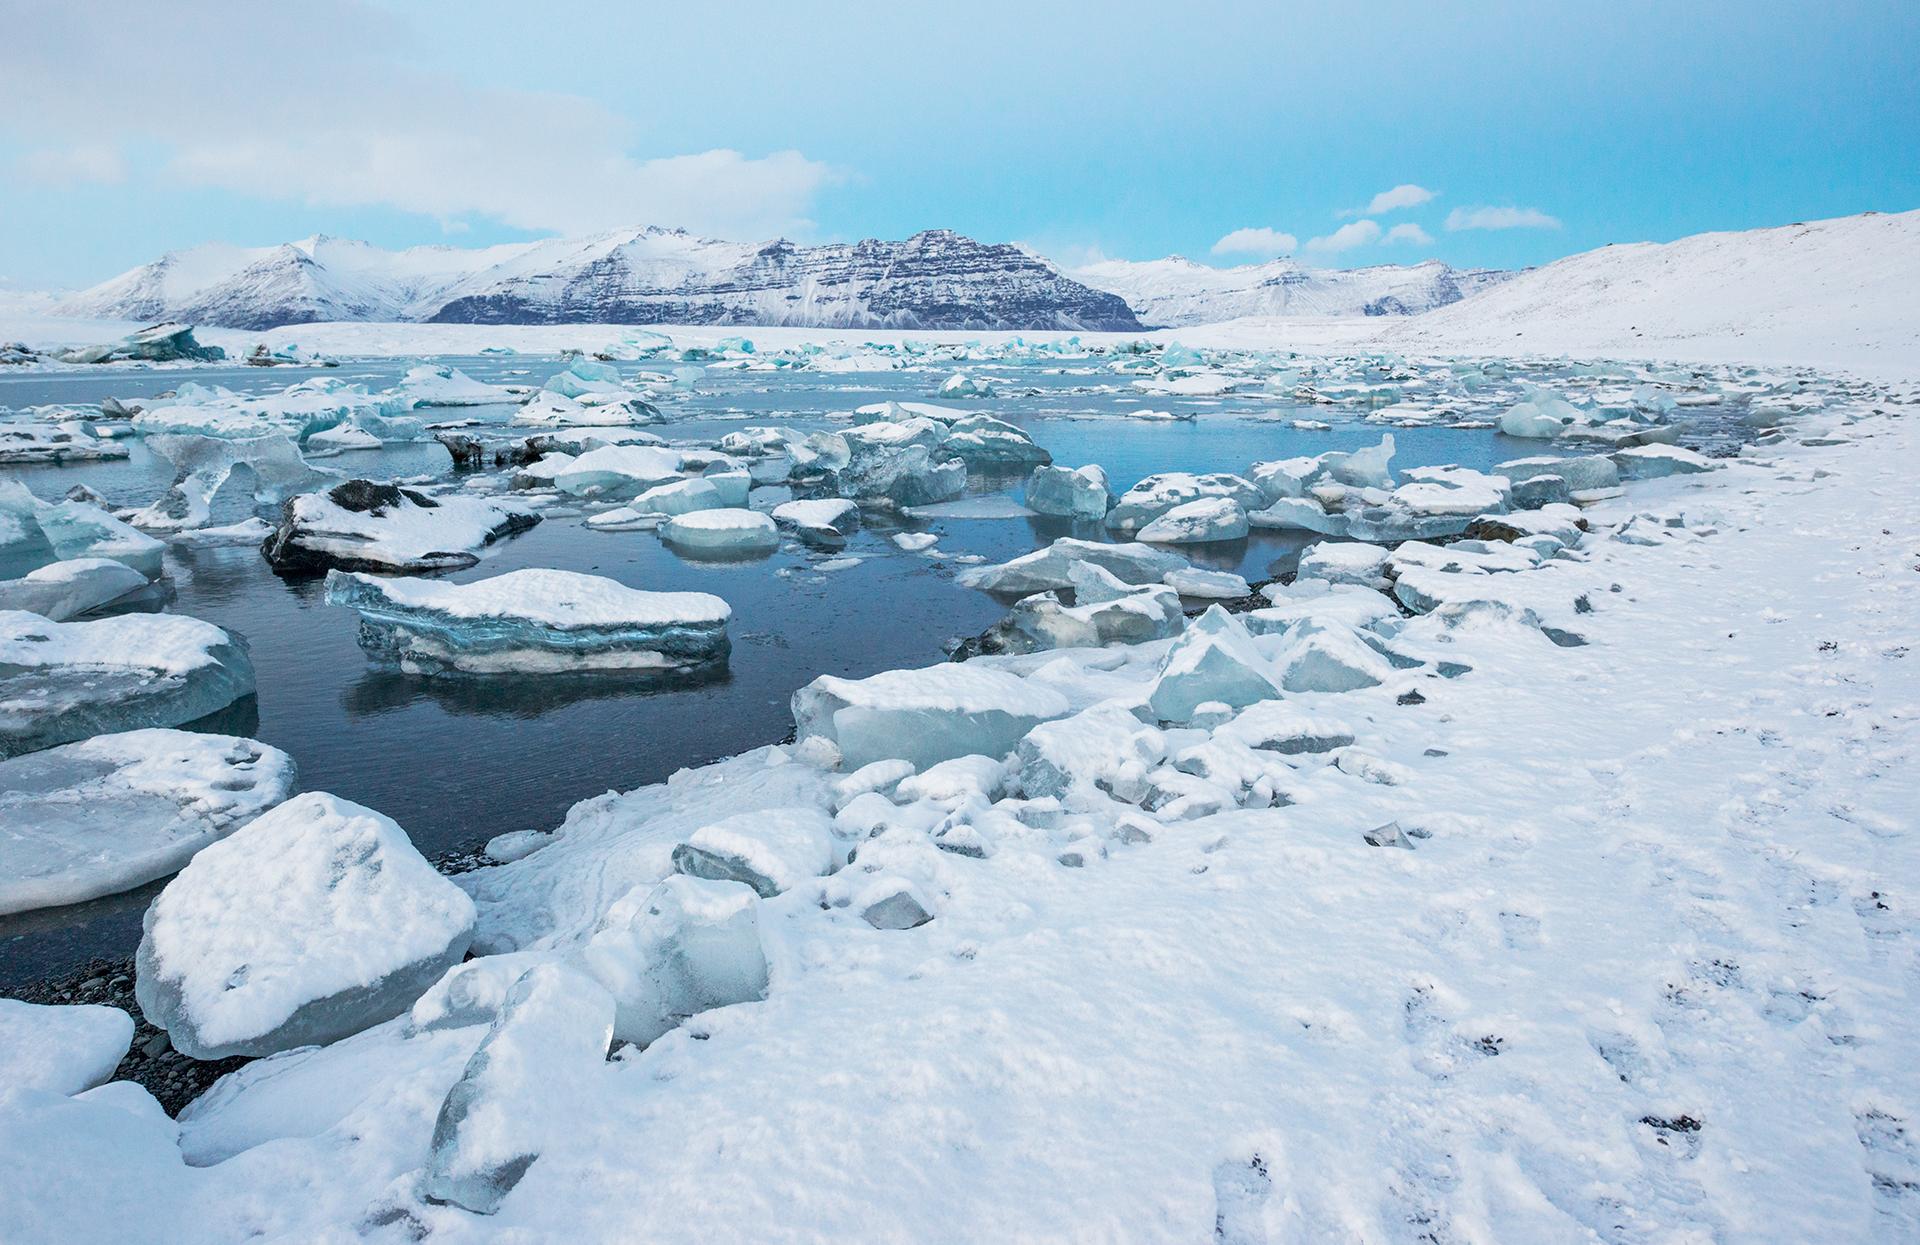 Jokulsarlon icelandic glacier lagoon winter days